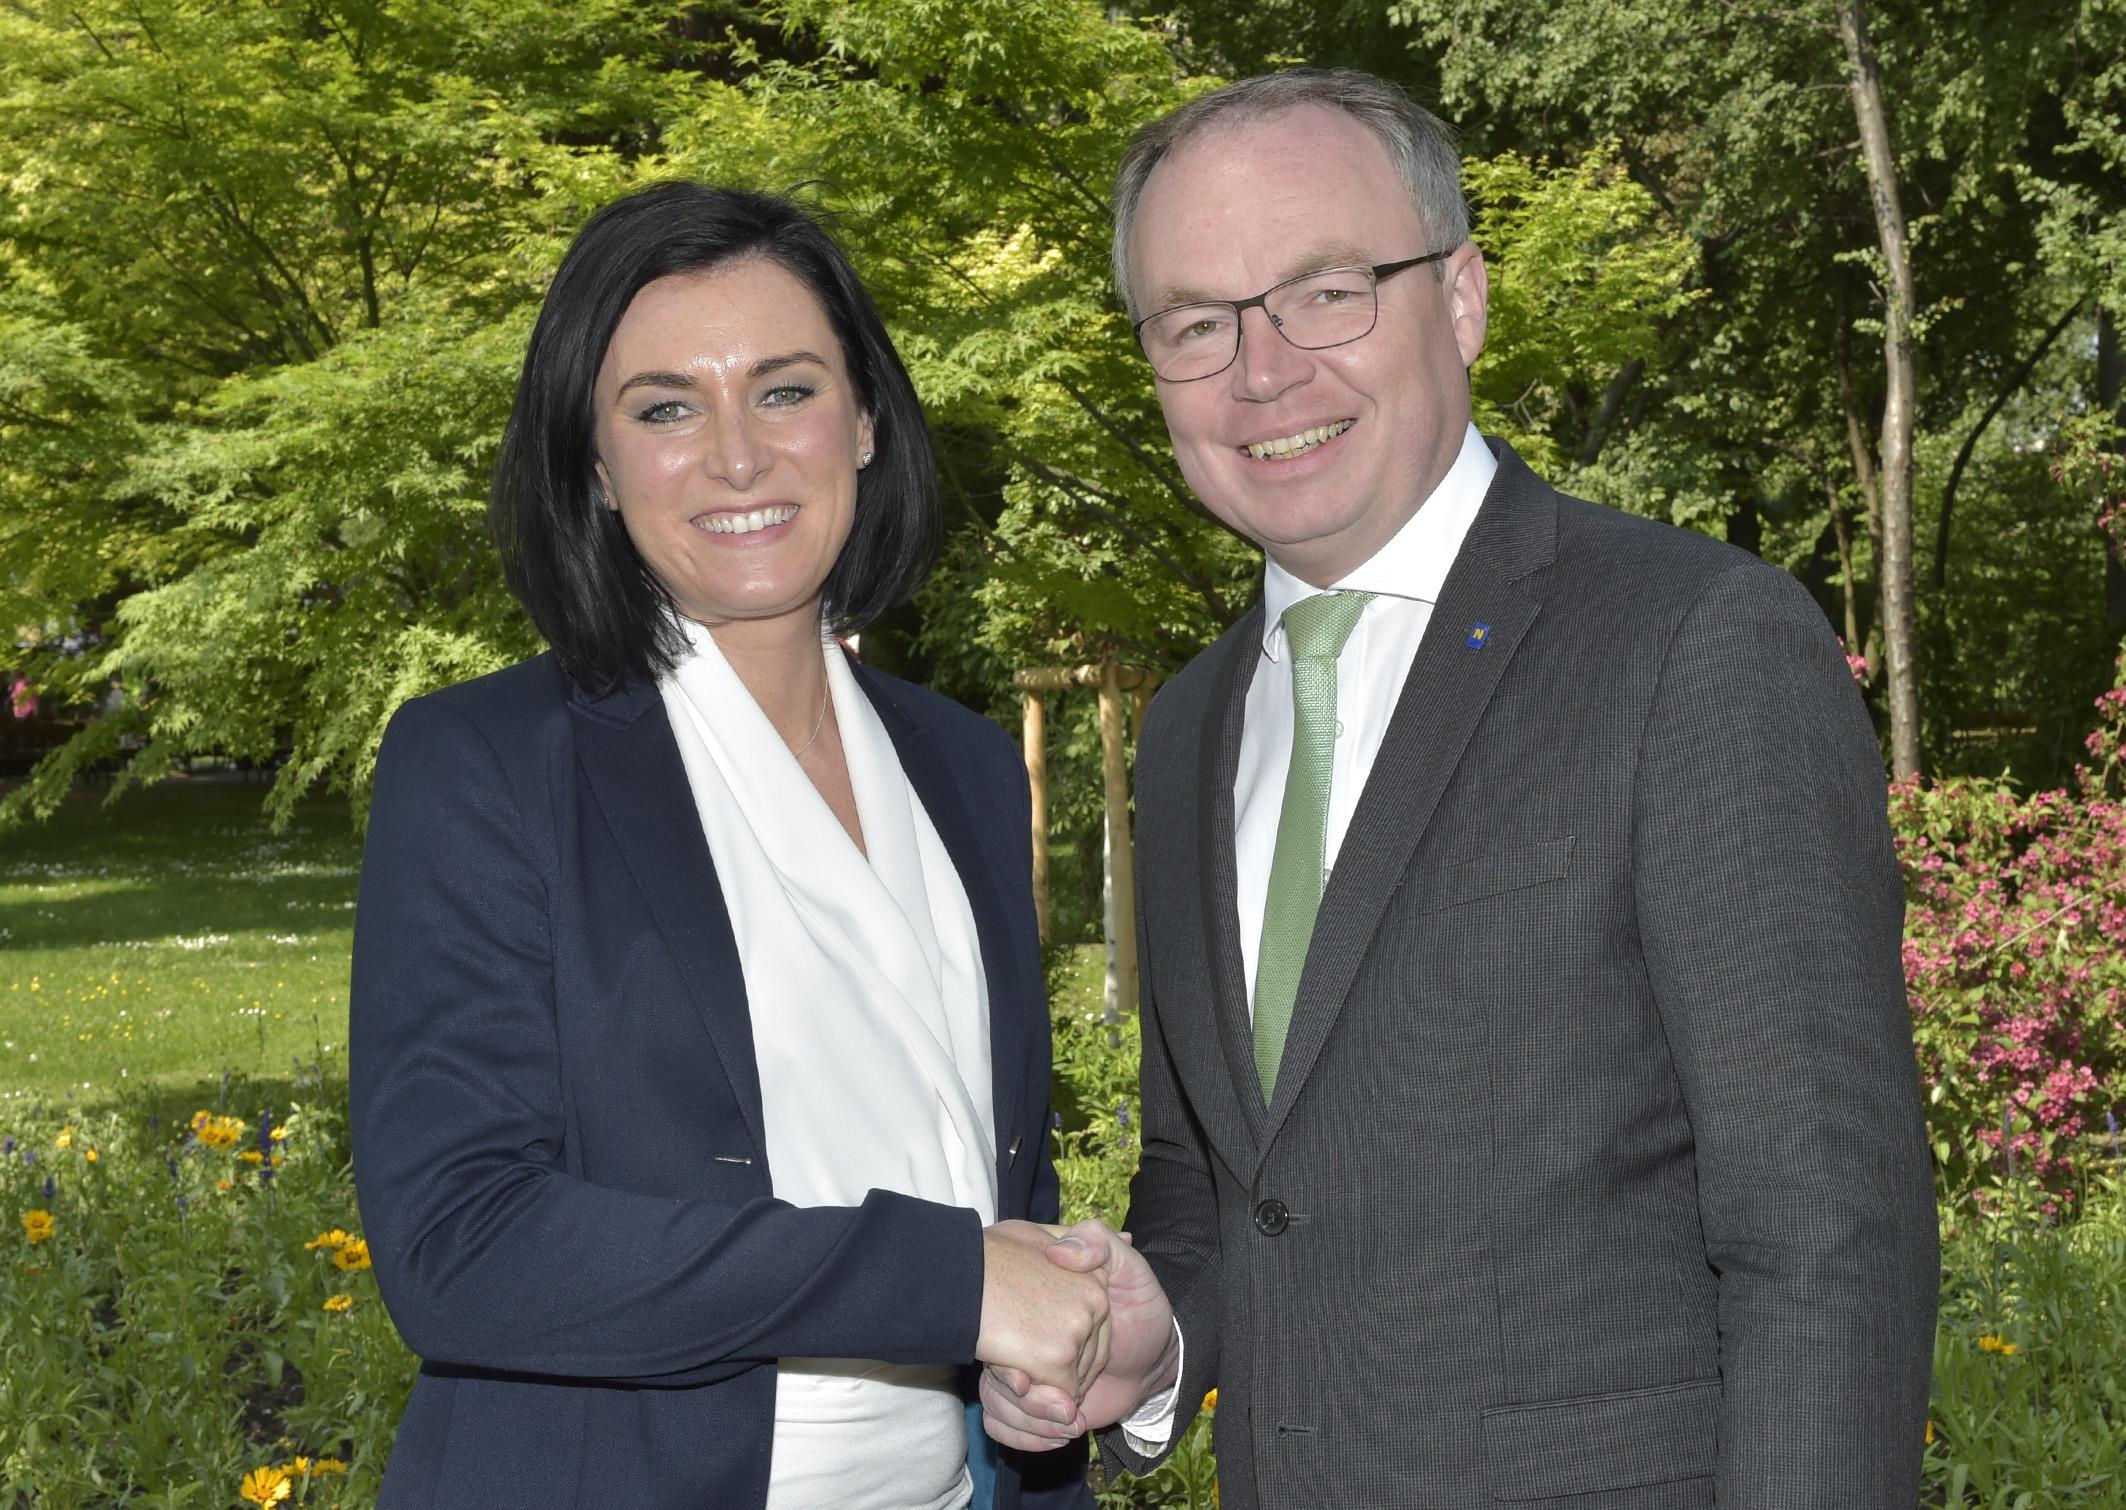 EU-Abgeordnete Elisabeth Köstlinger und Umwelt-Landesrat Stephan Pernkopf Foto: NLK, Pfeiffer